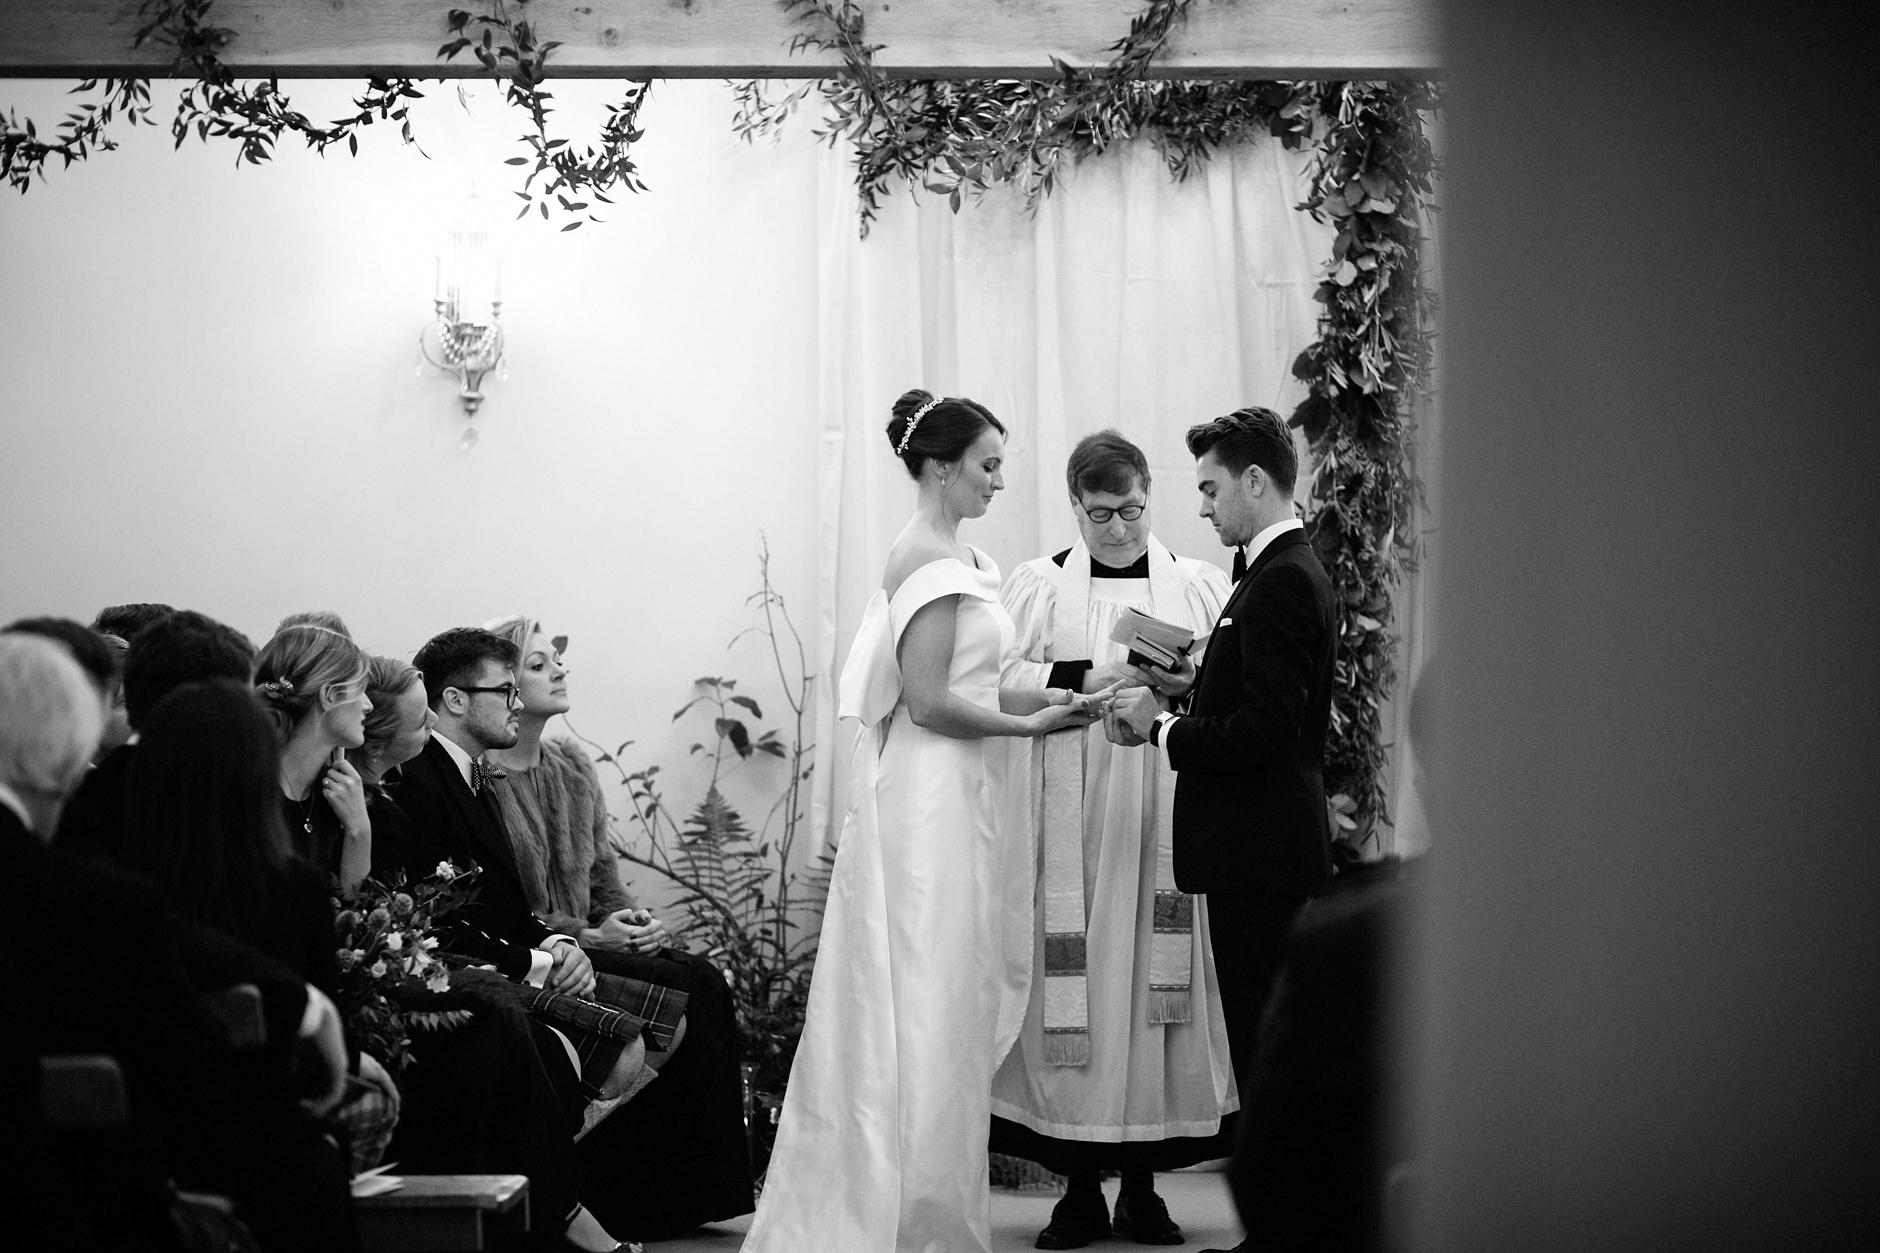 Glentruim-Wedding-Nikki-Leadbetter-Photography-95.jpg